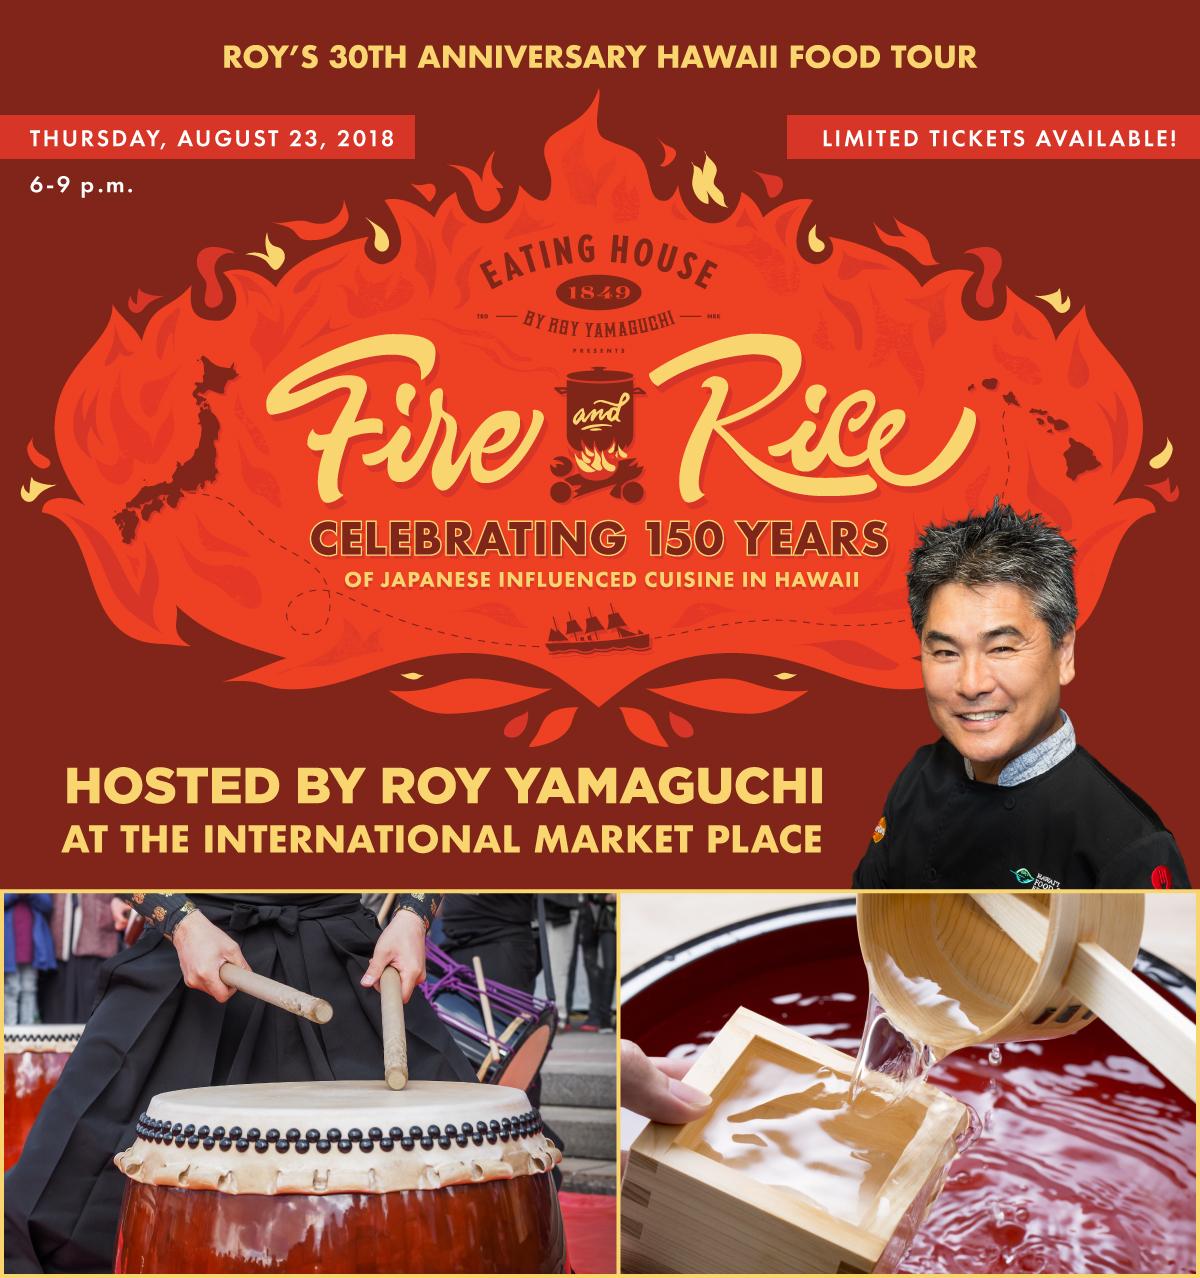 RY_Fire-and-Rice-Waikiki_08-2018.jpg